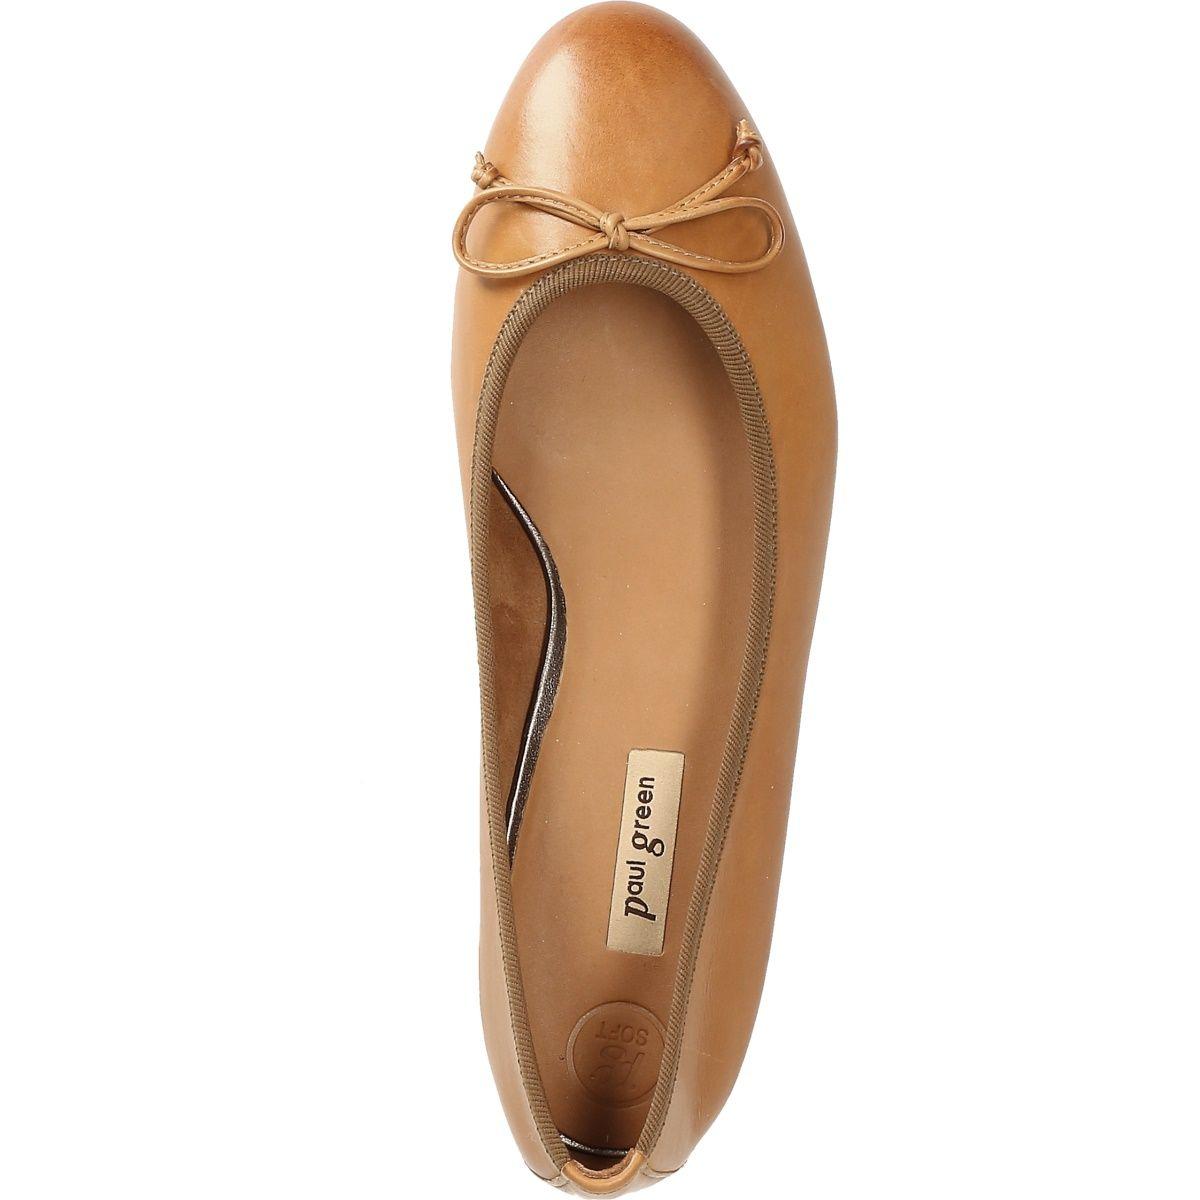 Paul Green 2398 092 Damenschuhe Ballerina im Schuhe Lüke